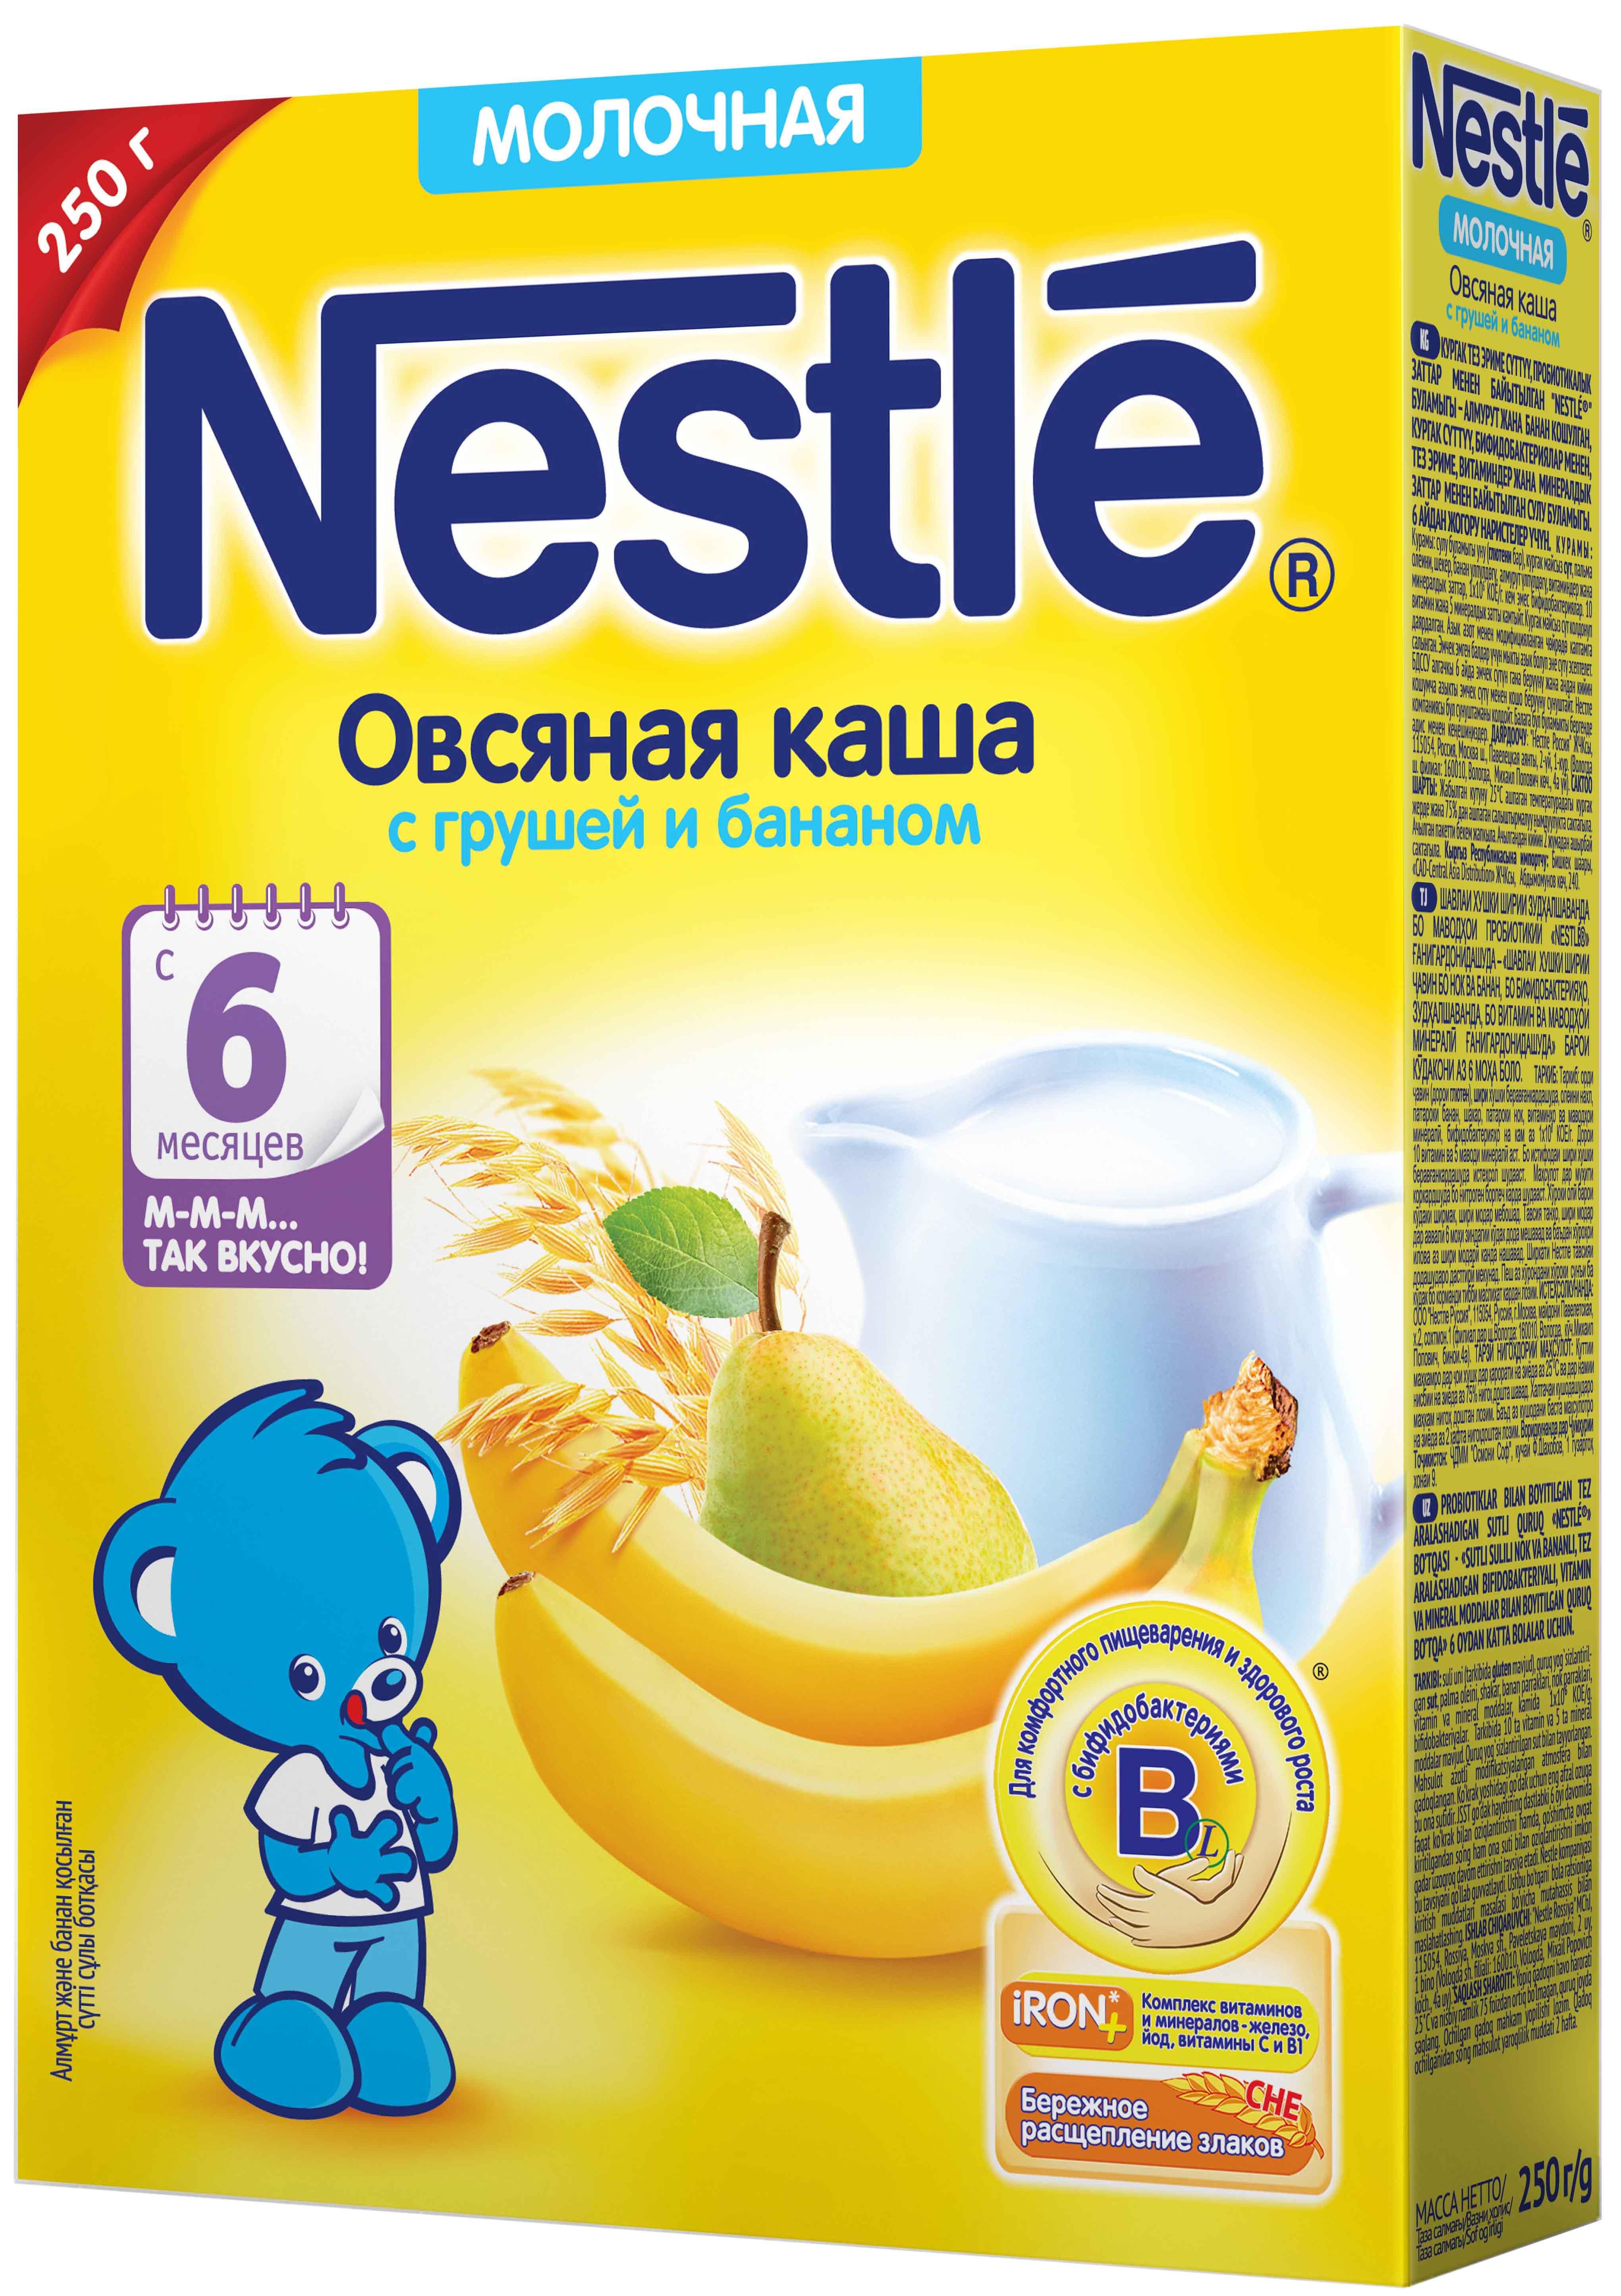 Каши Nestle Каша Nestle молочная овсяная с грушей и бананом с 6 мес. 250 г каши bebi молочная каша premium 7 злаков с 6 мес 200 г